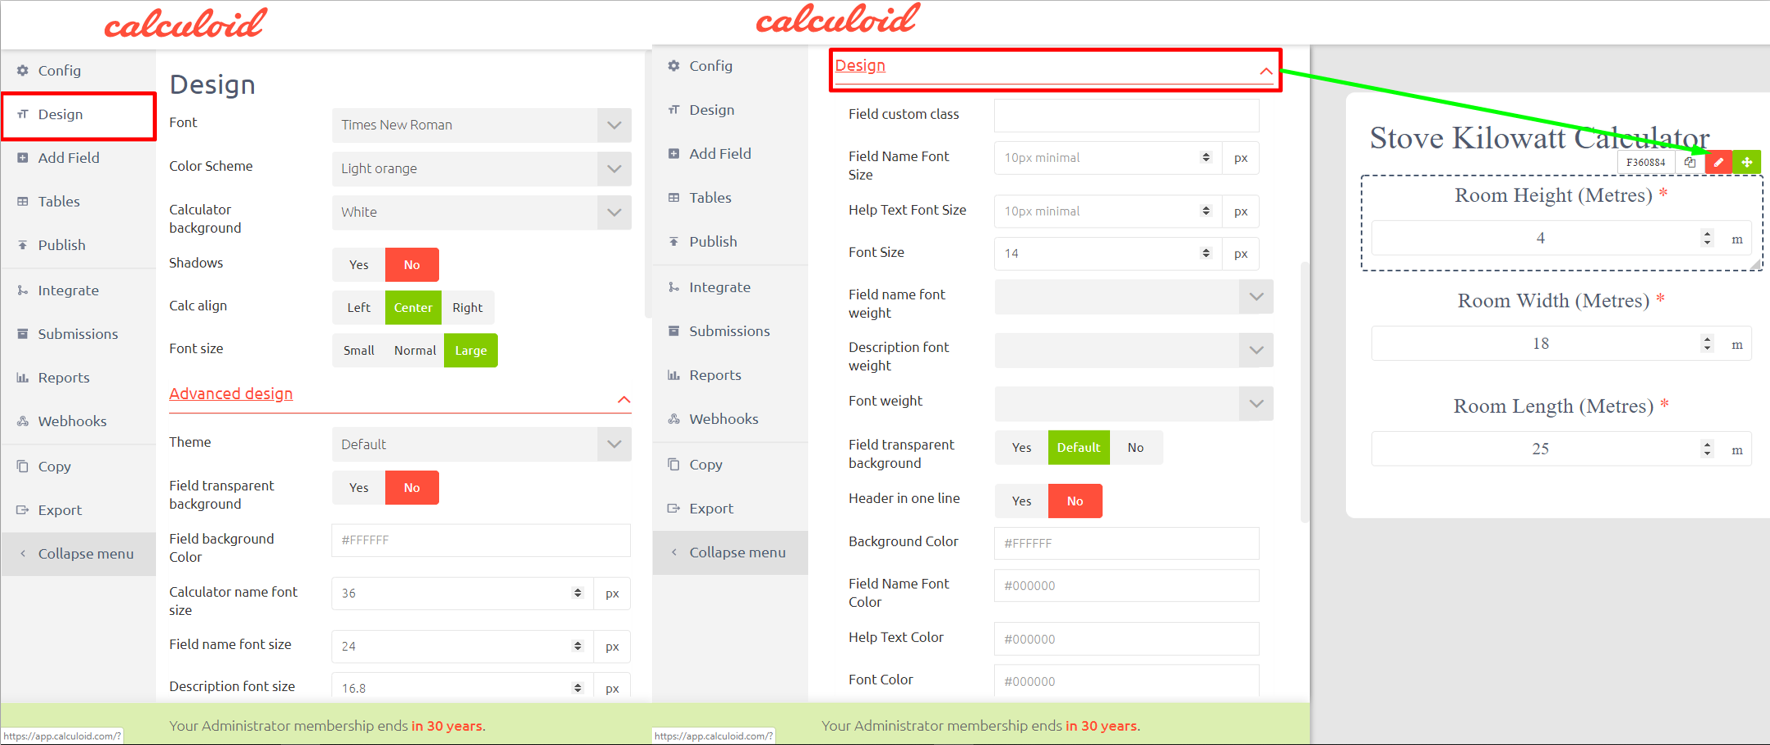 Calculoid.com